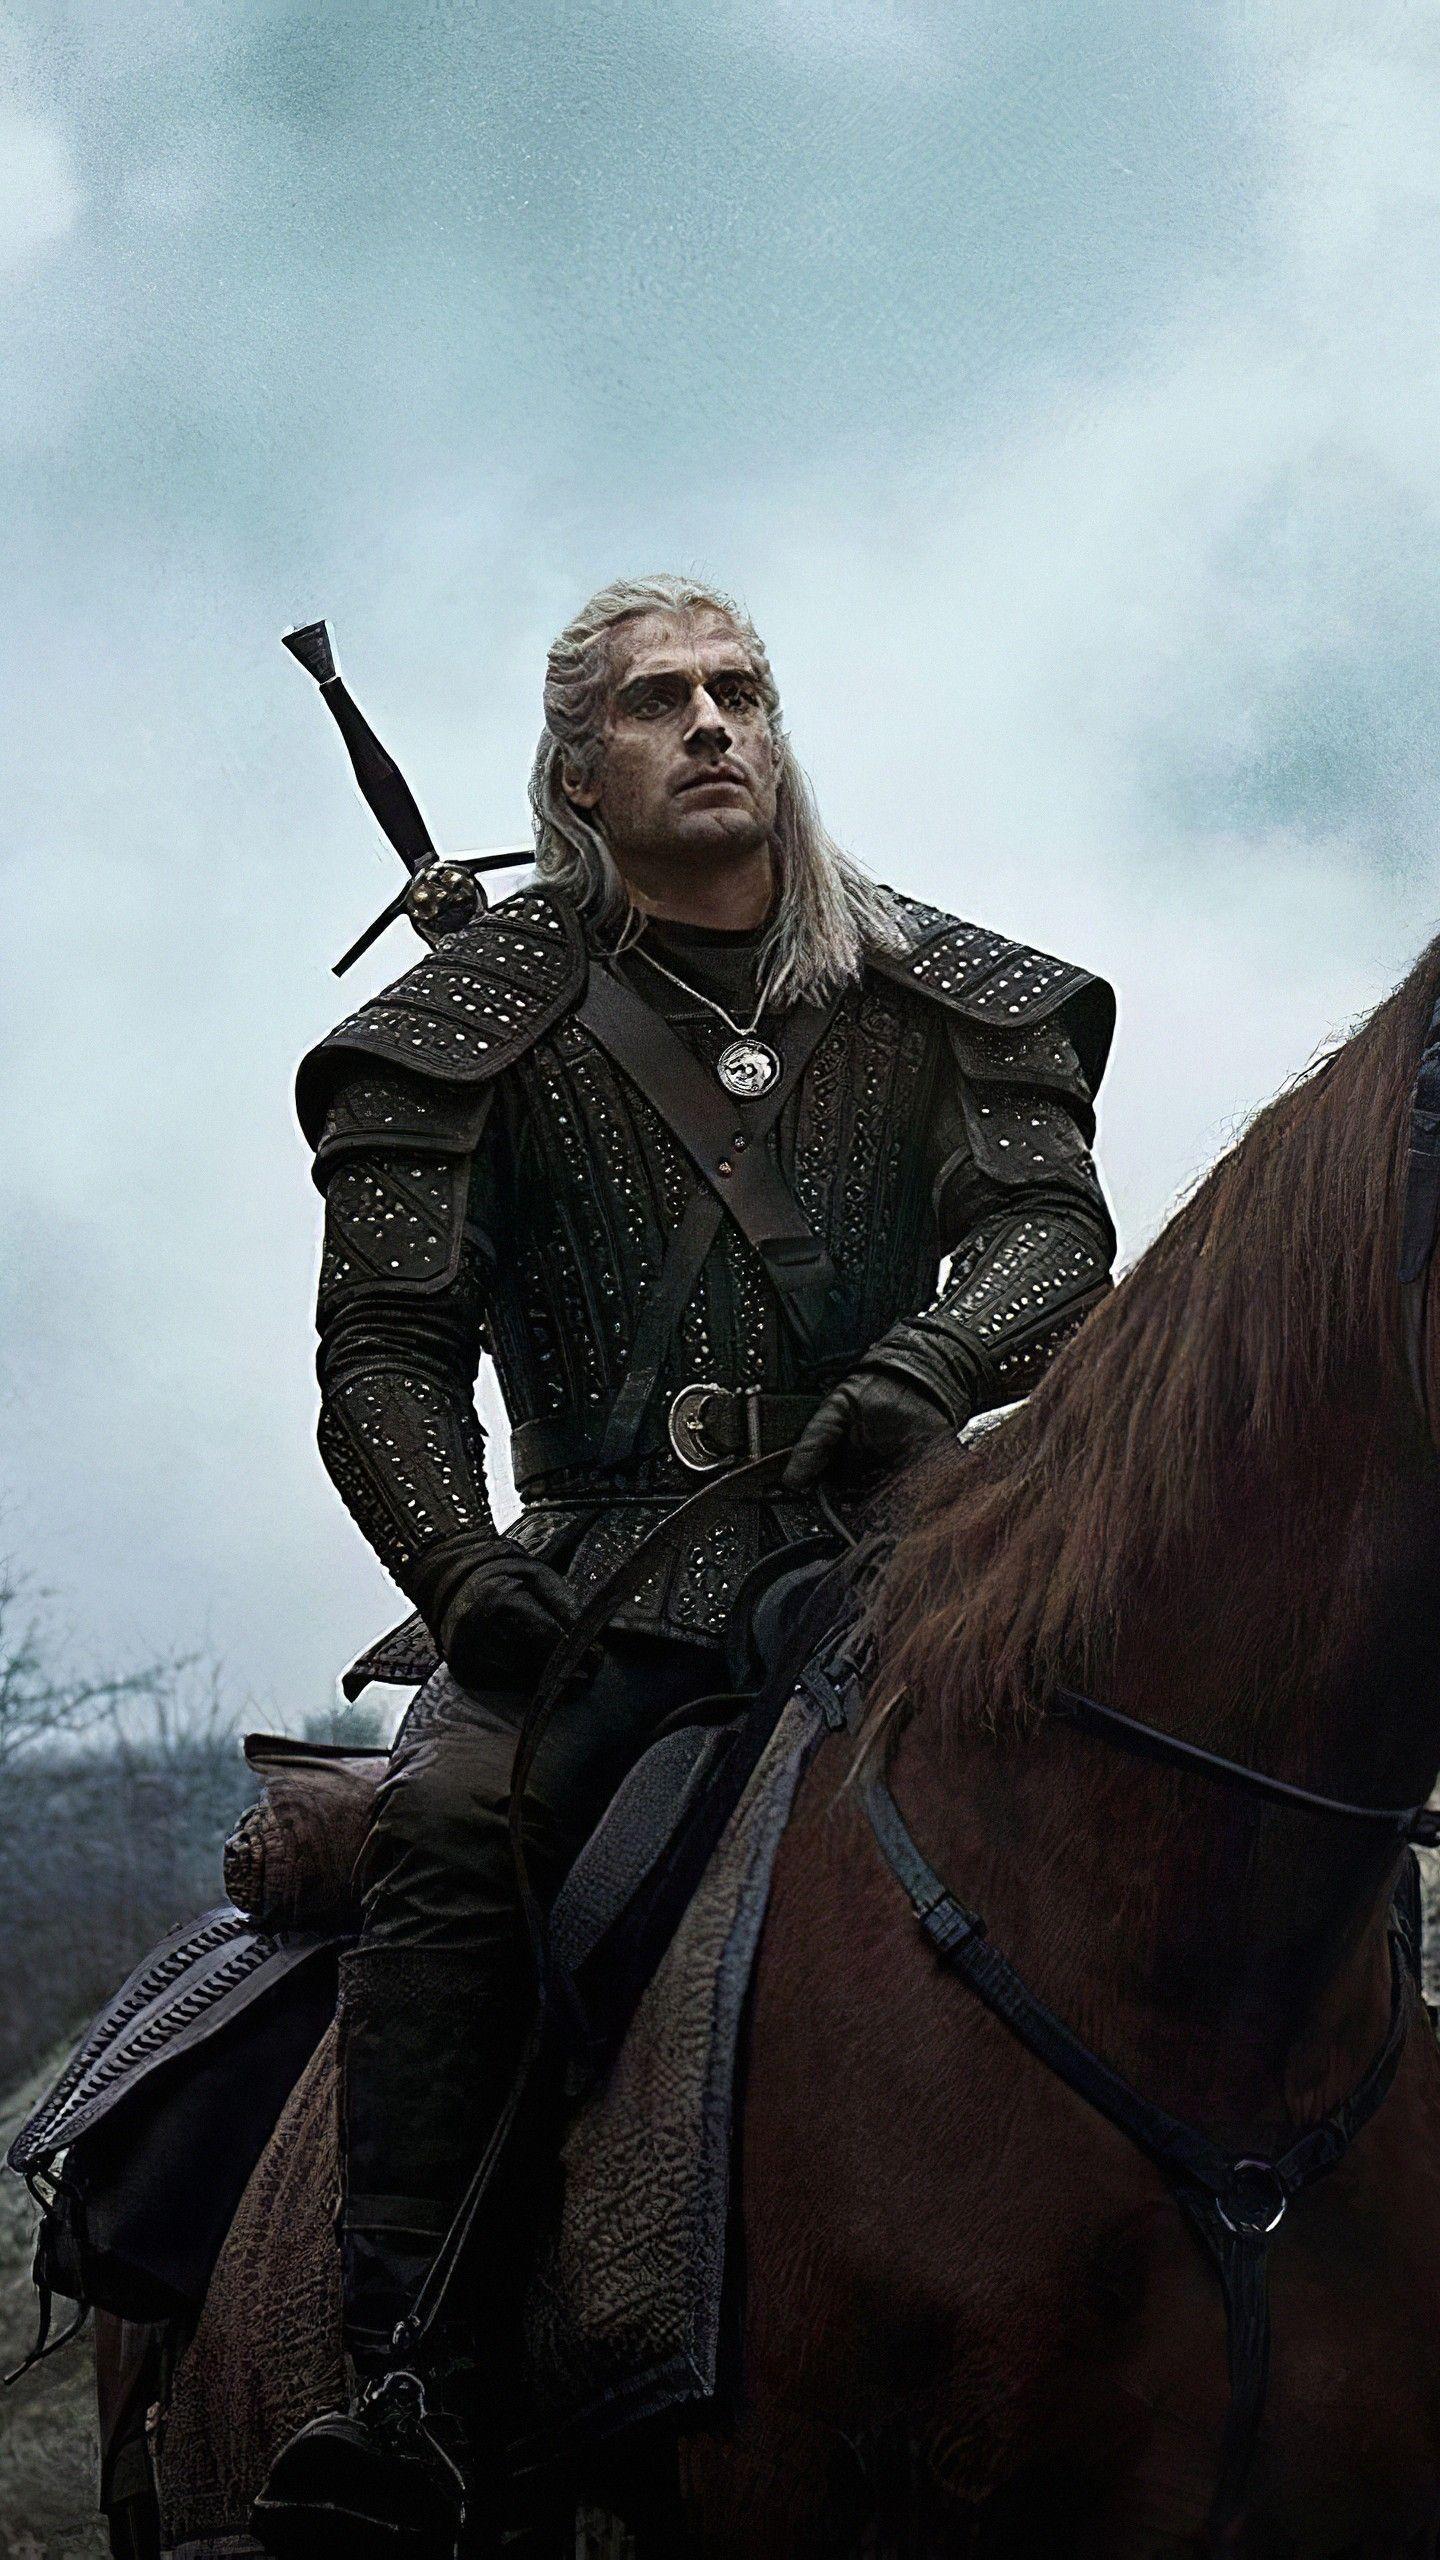 The Witcher Netflix Tv Series Release Date Cast Story The Witcher Witcher Wallpapers The Witcher Wallpaper